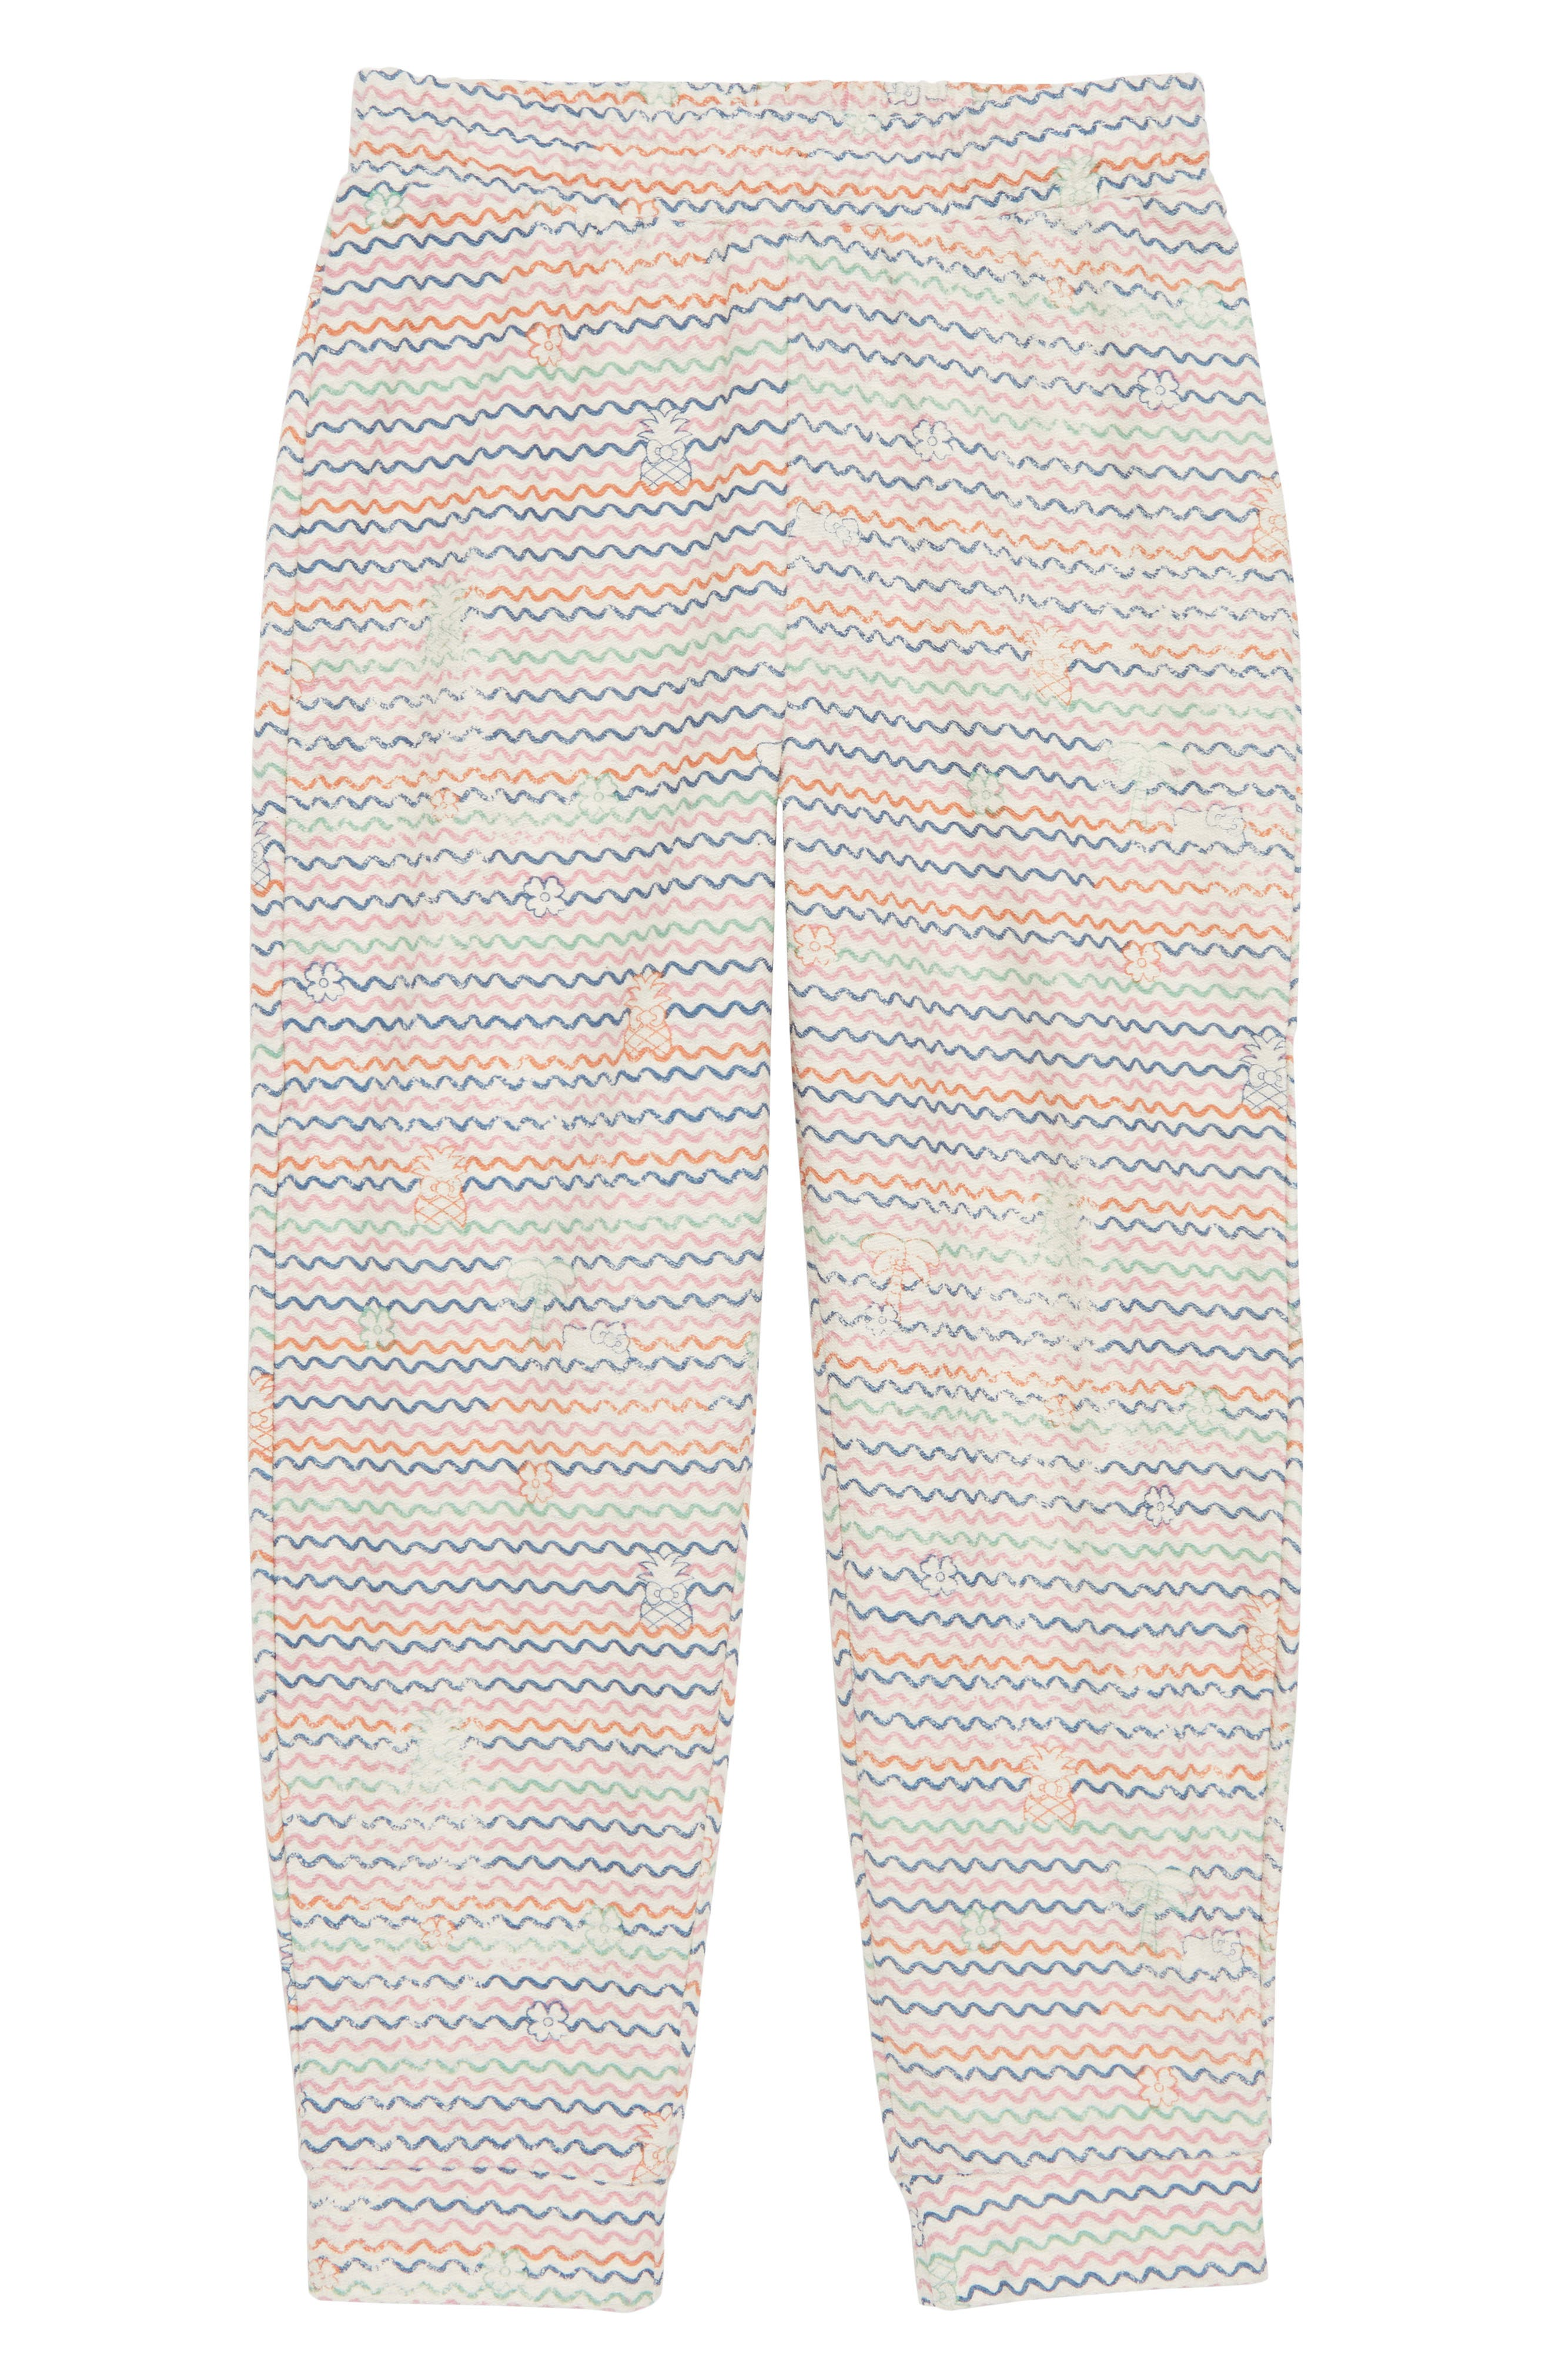 x Hello Kitty<sup>®</sup> Tropical Treasures Fleece Pants,                             Main thumbnail 1, color,                             250